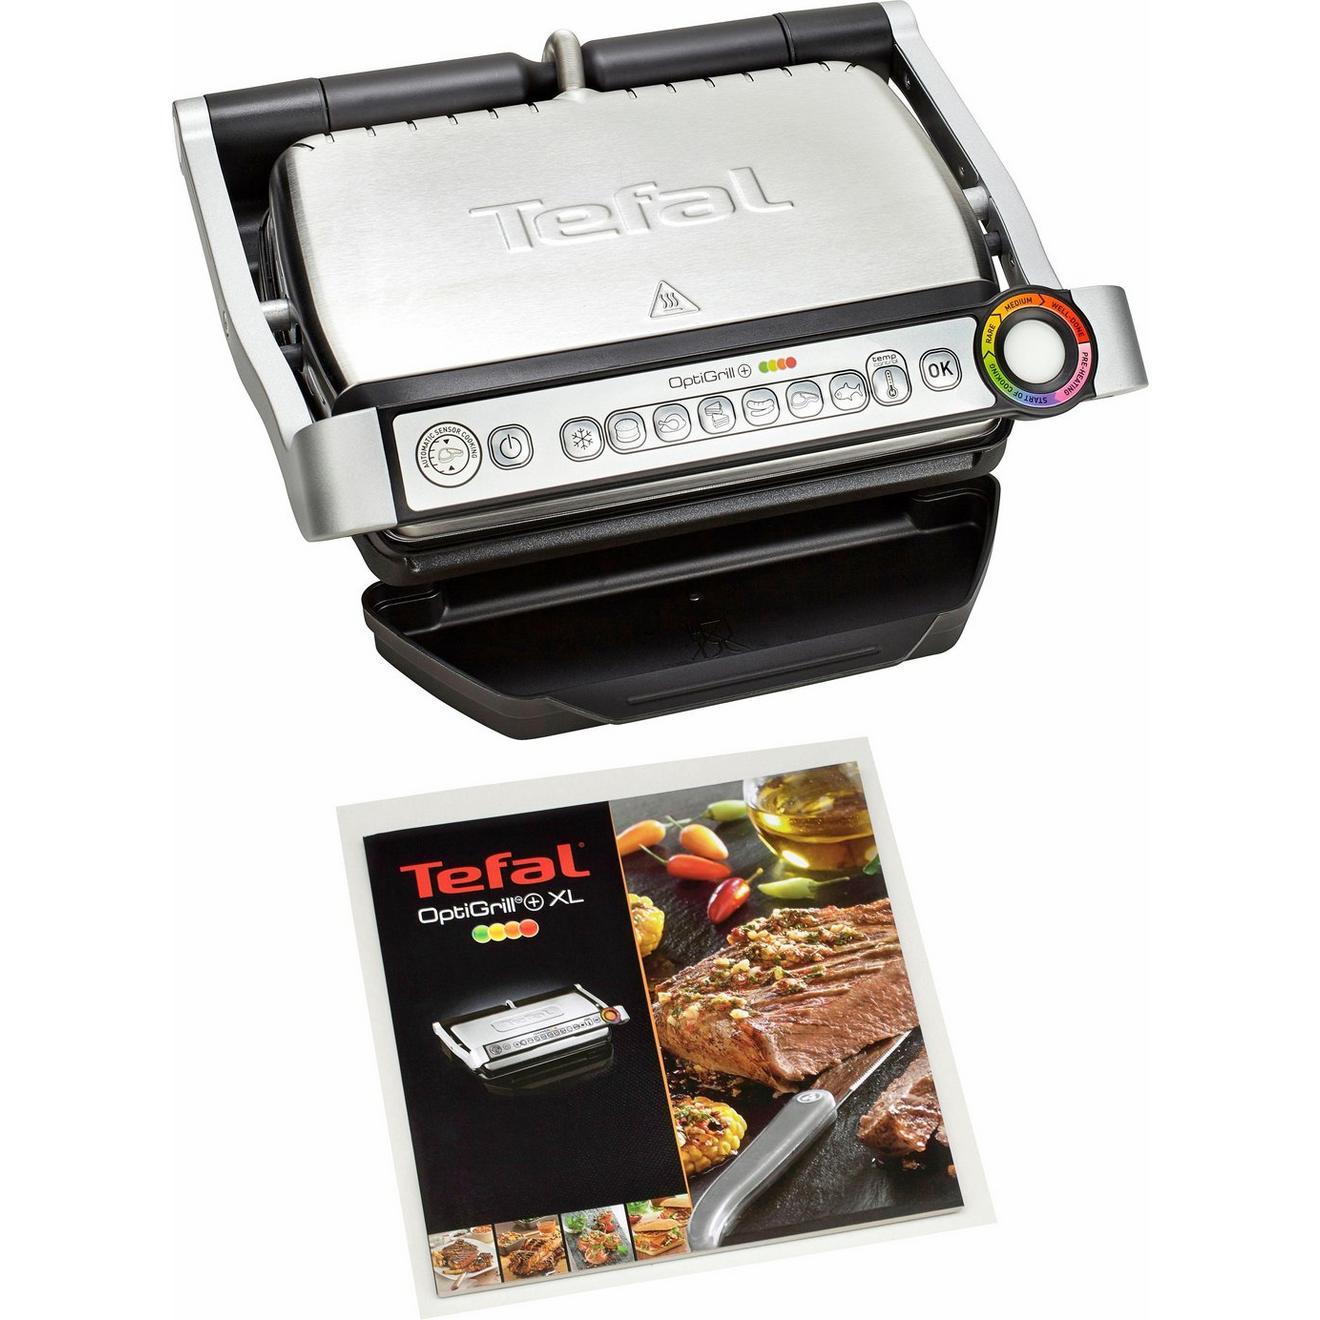 Tefal GC712D OptiGrill+ Kontaktgrill Plus Modell mit 4 Temperaturstufen für 84€ inkl. Versandkosten